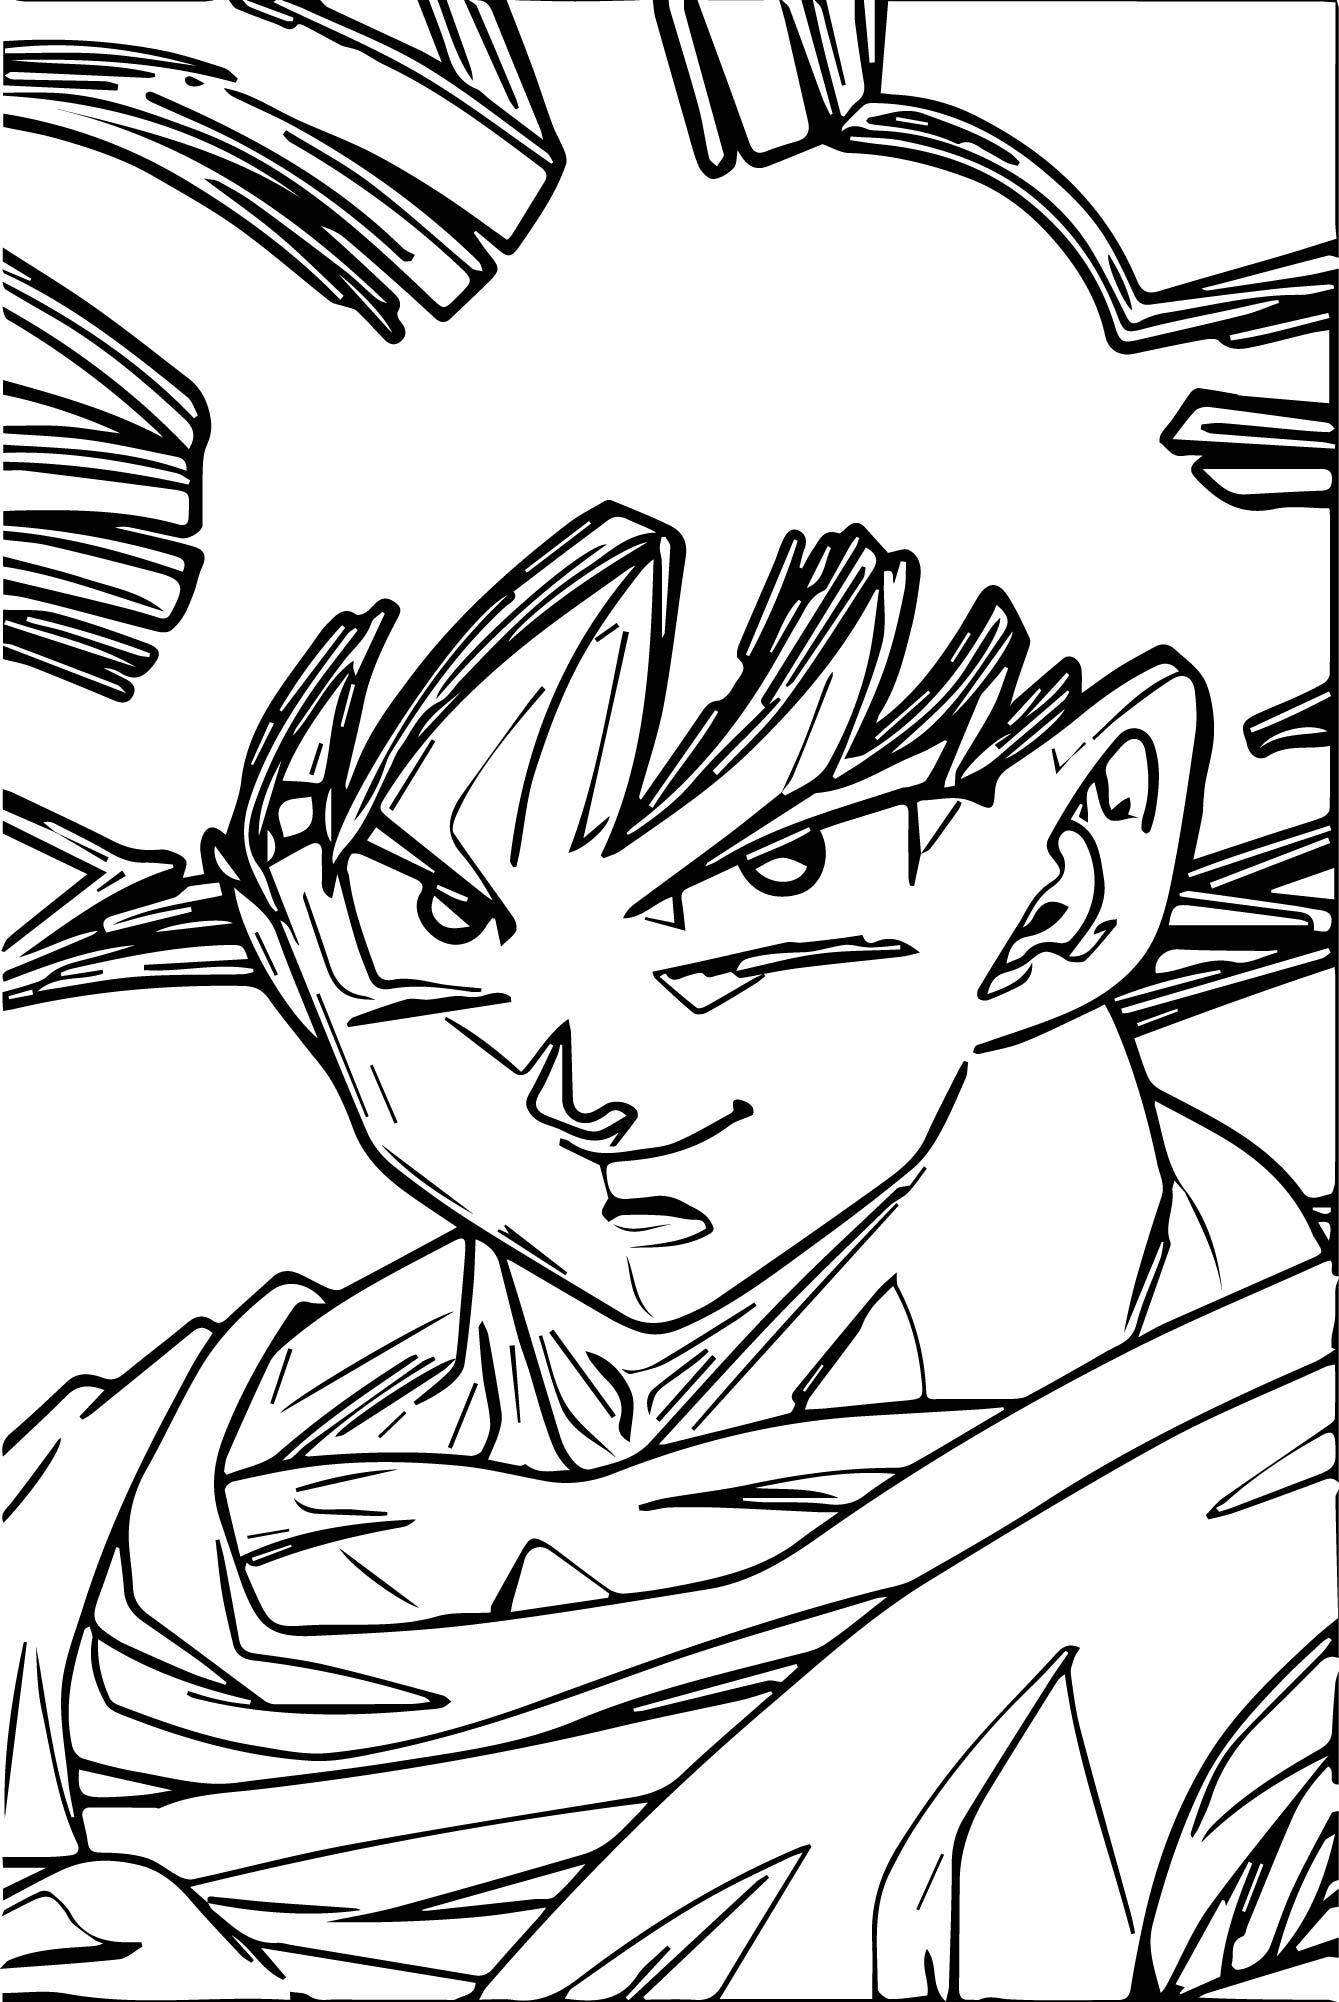 Goku We Coloring Page 465